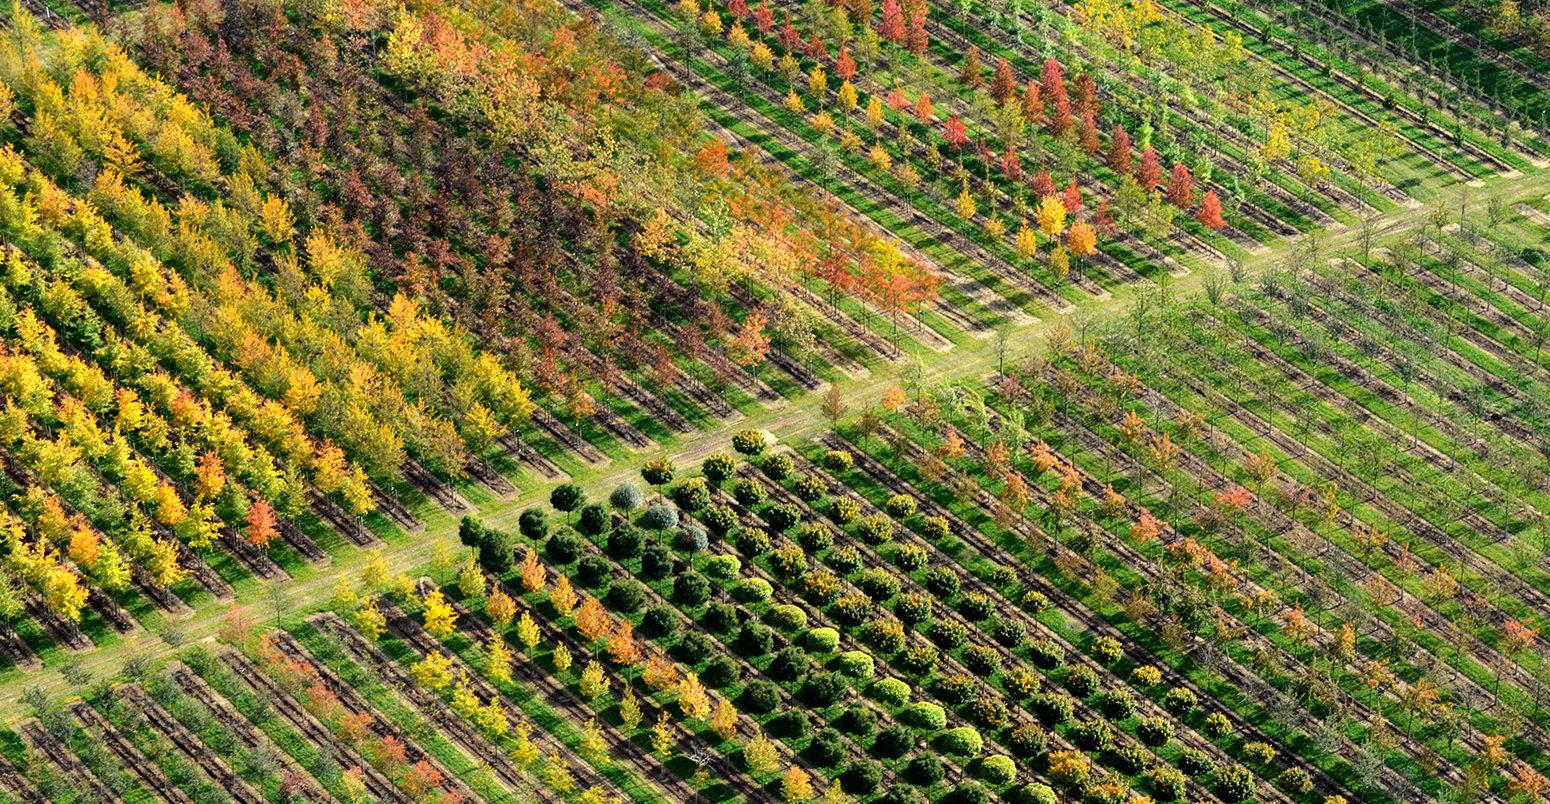 Aerial view, tree nursery, Beckedorf, Lower Saxony, Germany